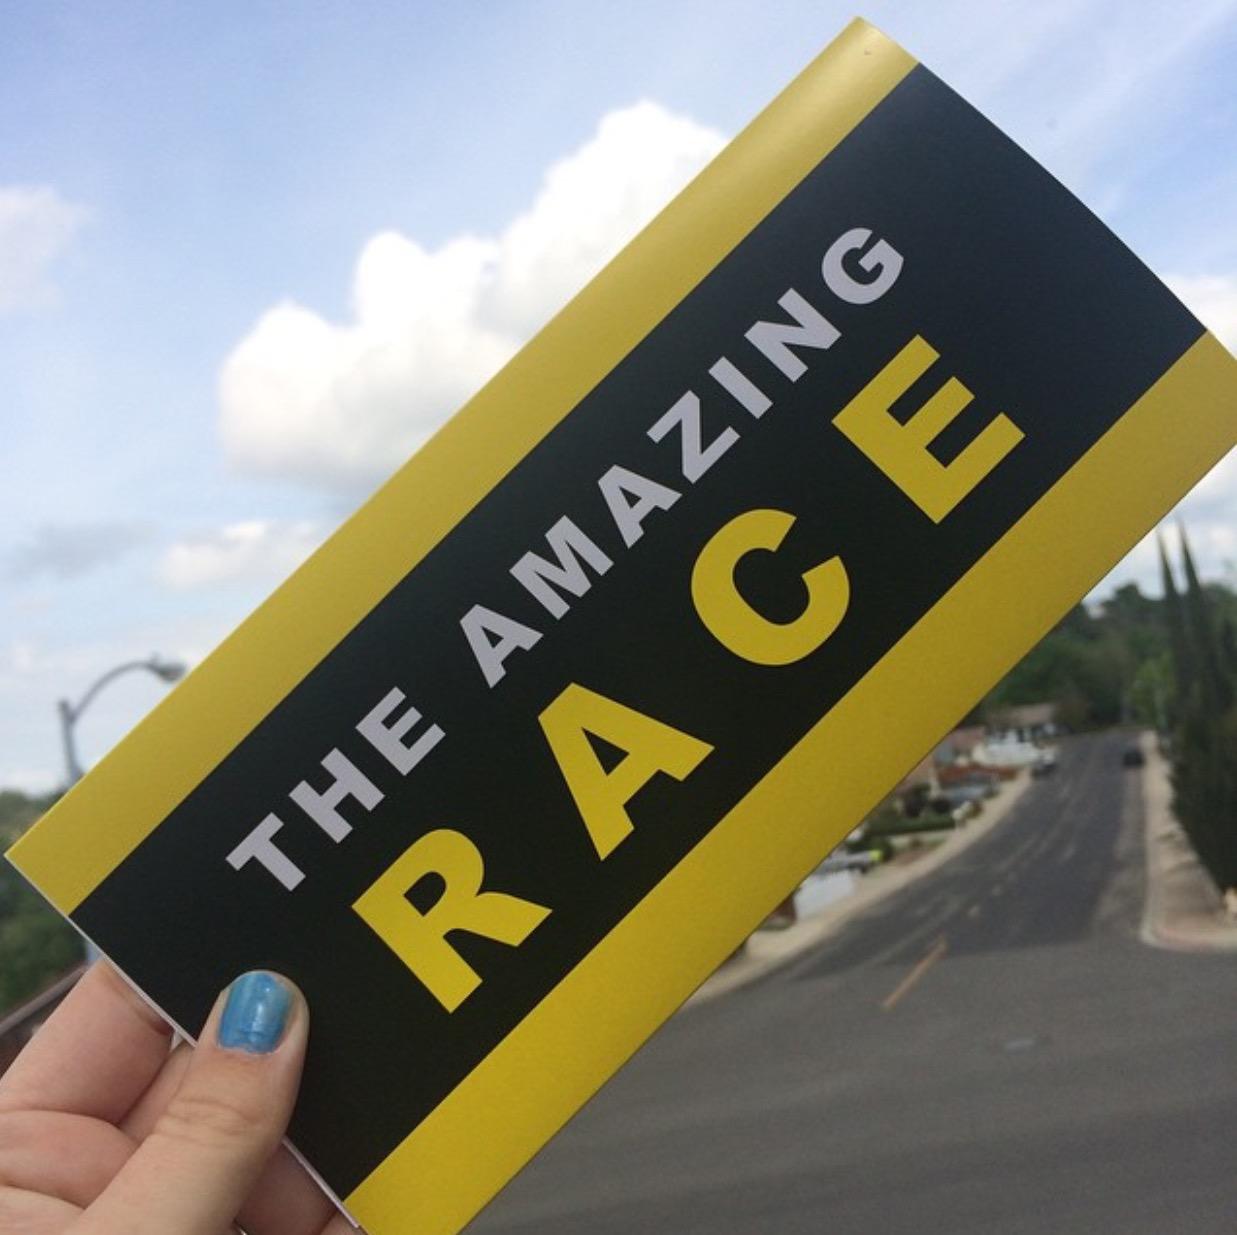 Amazing race ideas - An Amazing Race Birthday Party